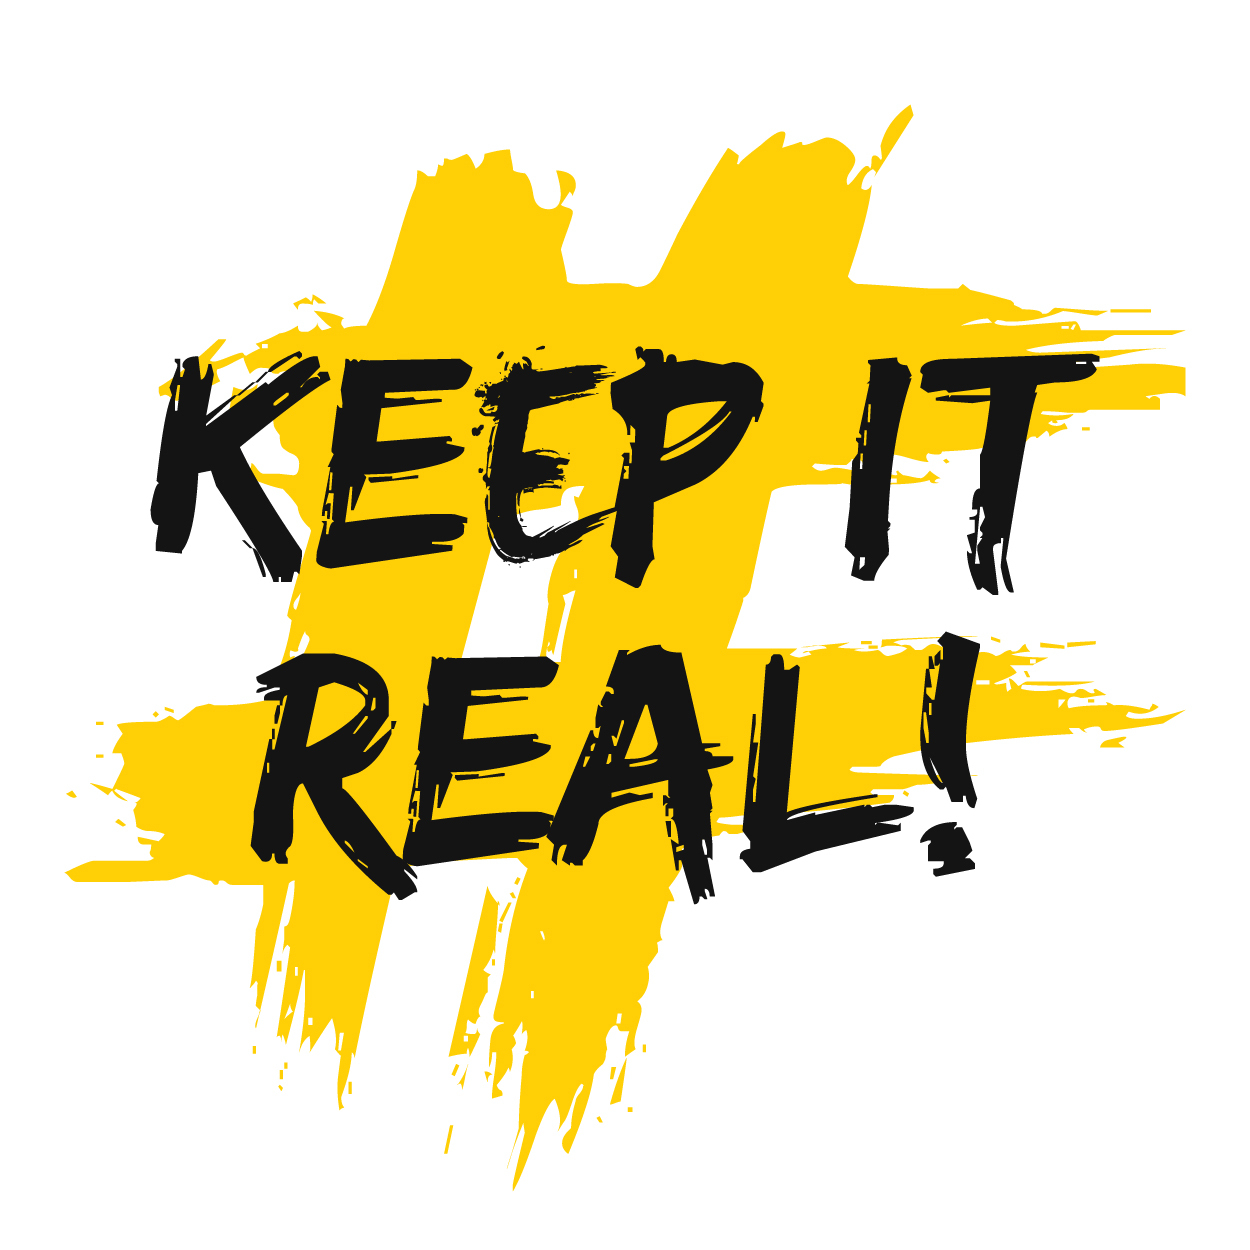 Keep-it-real.jpg